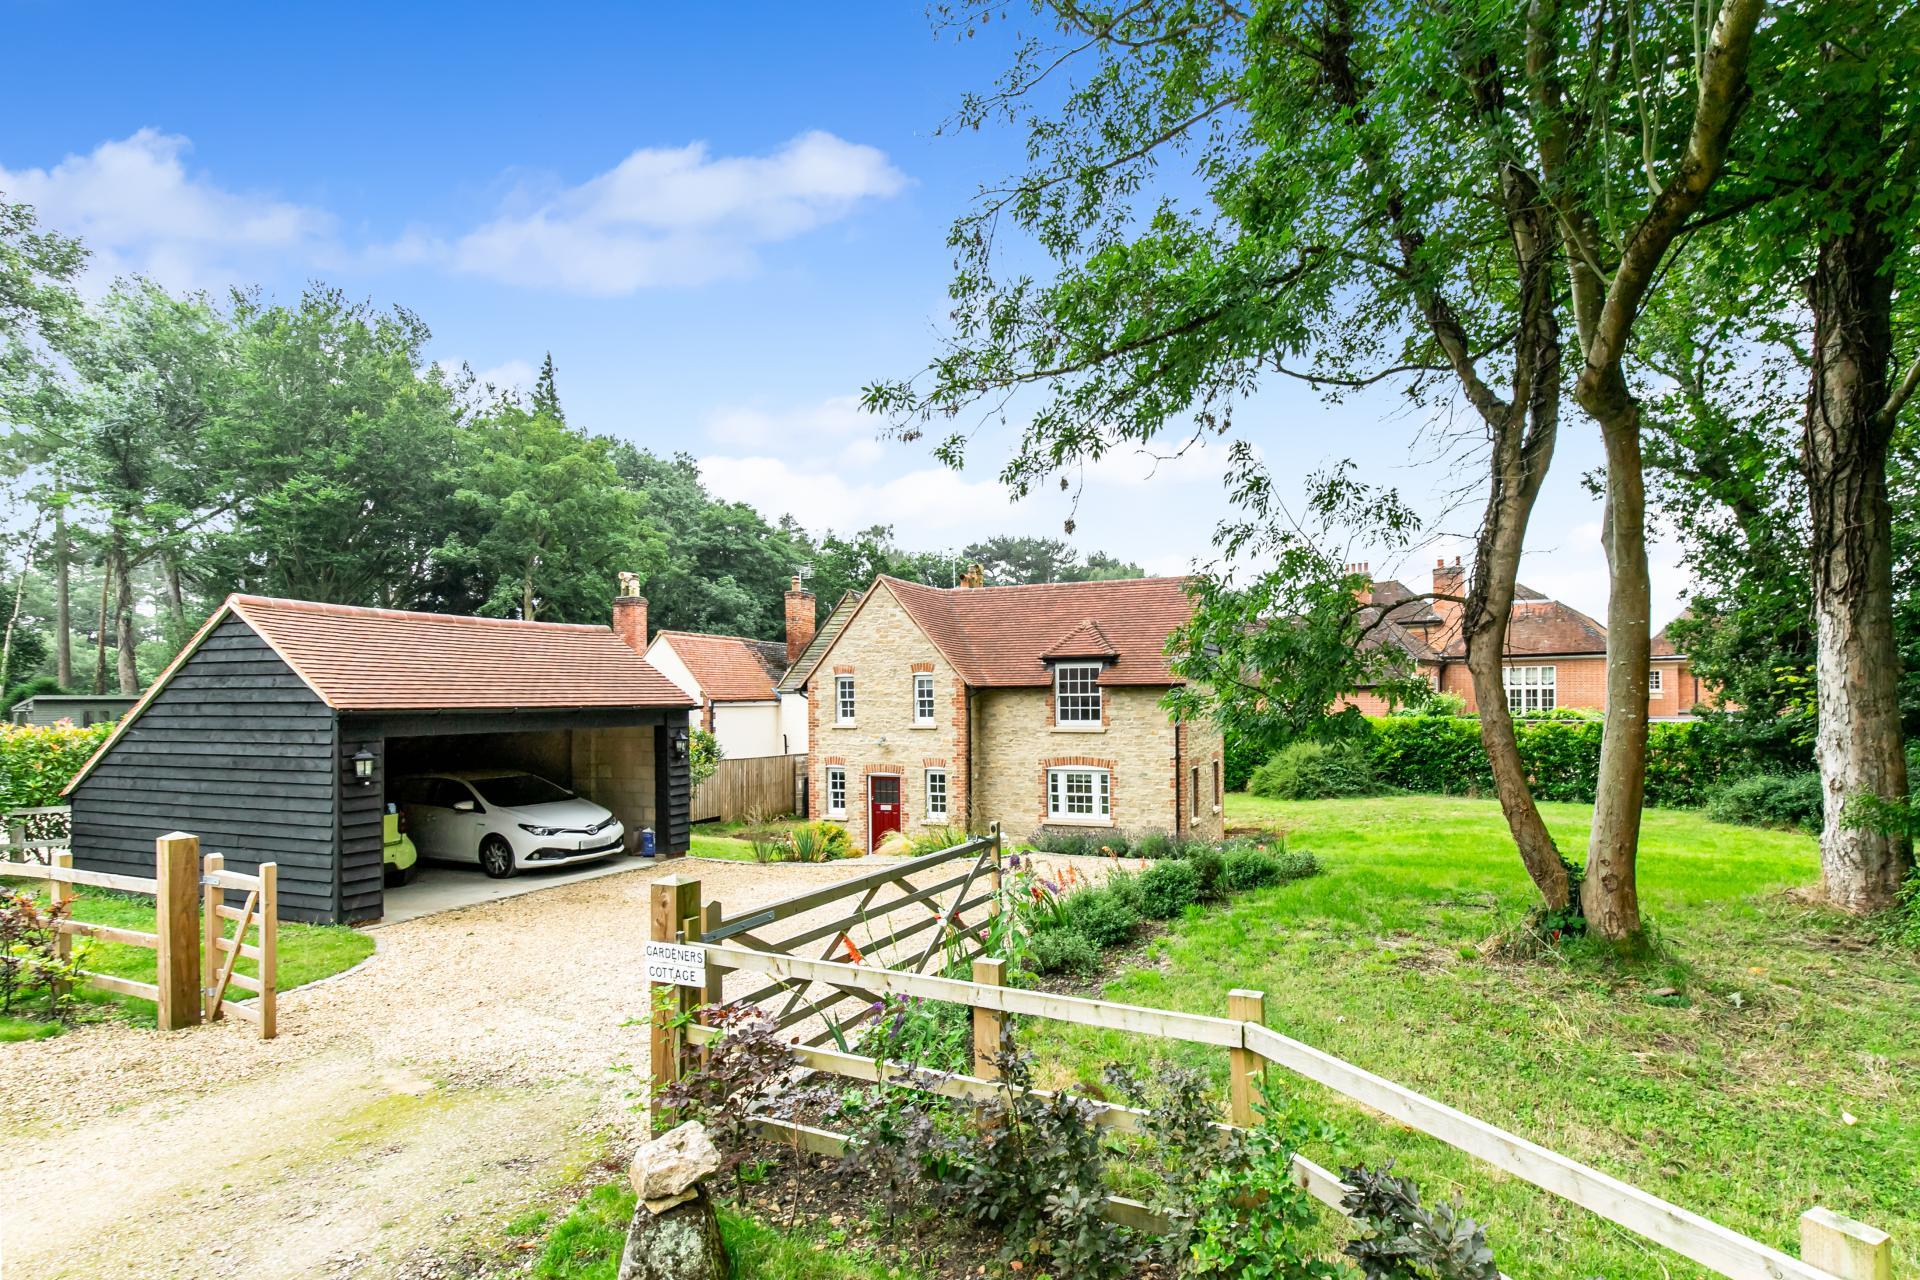 4 Bedroom Cottage for sale in Oxford